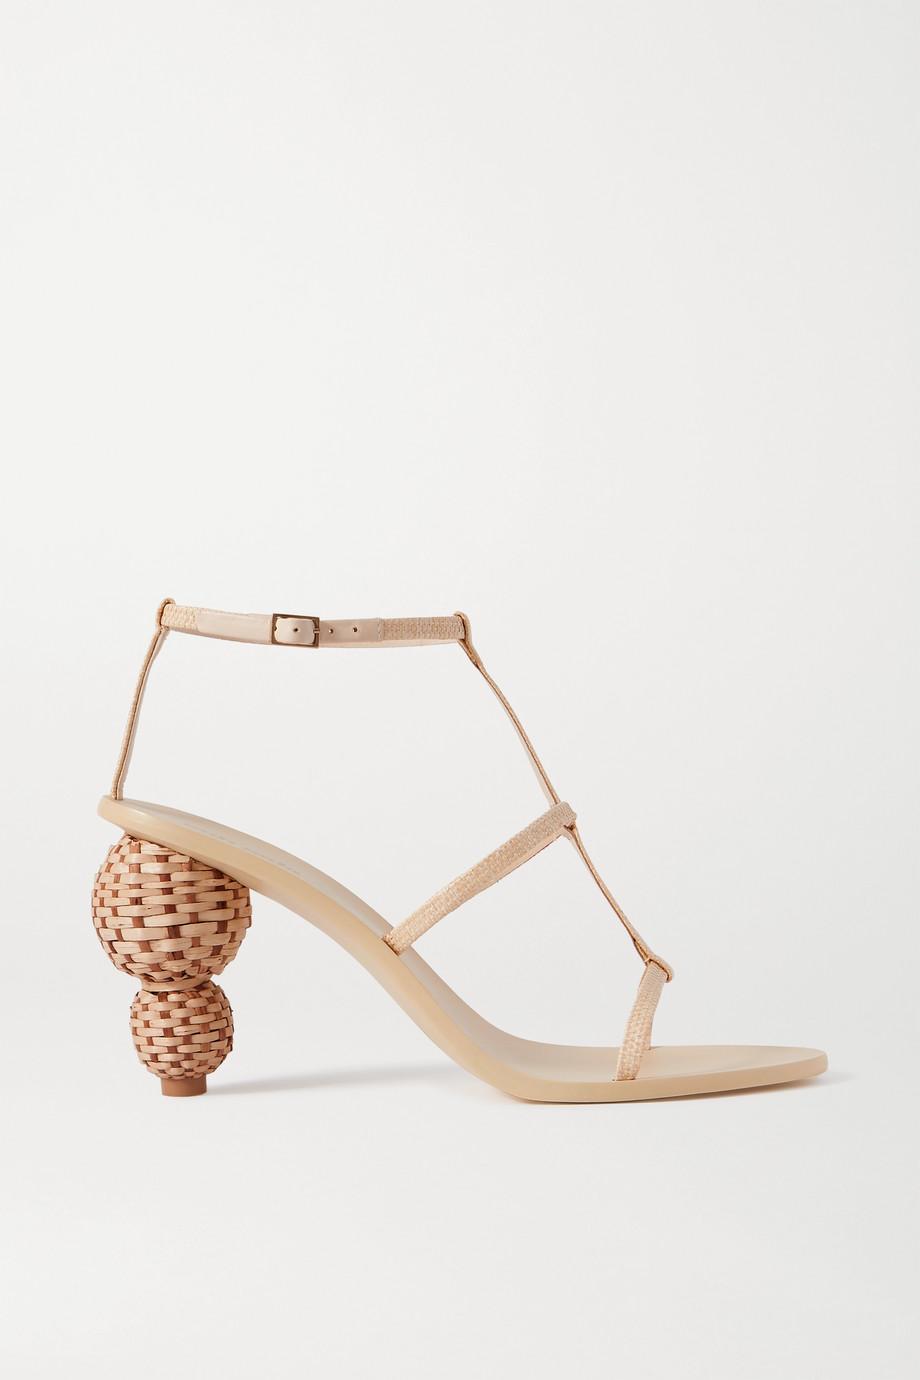 Cult Gaia Eden 拉菲草皮革凉鞋